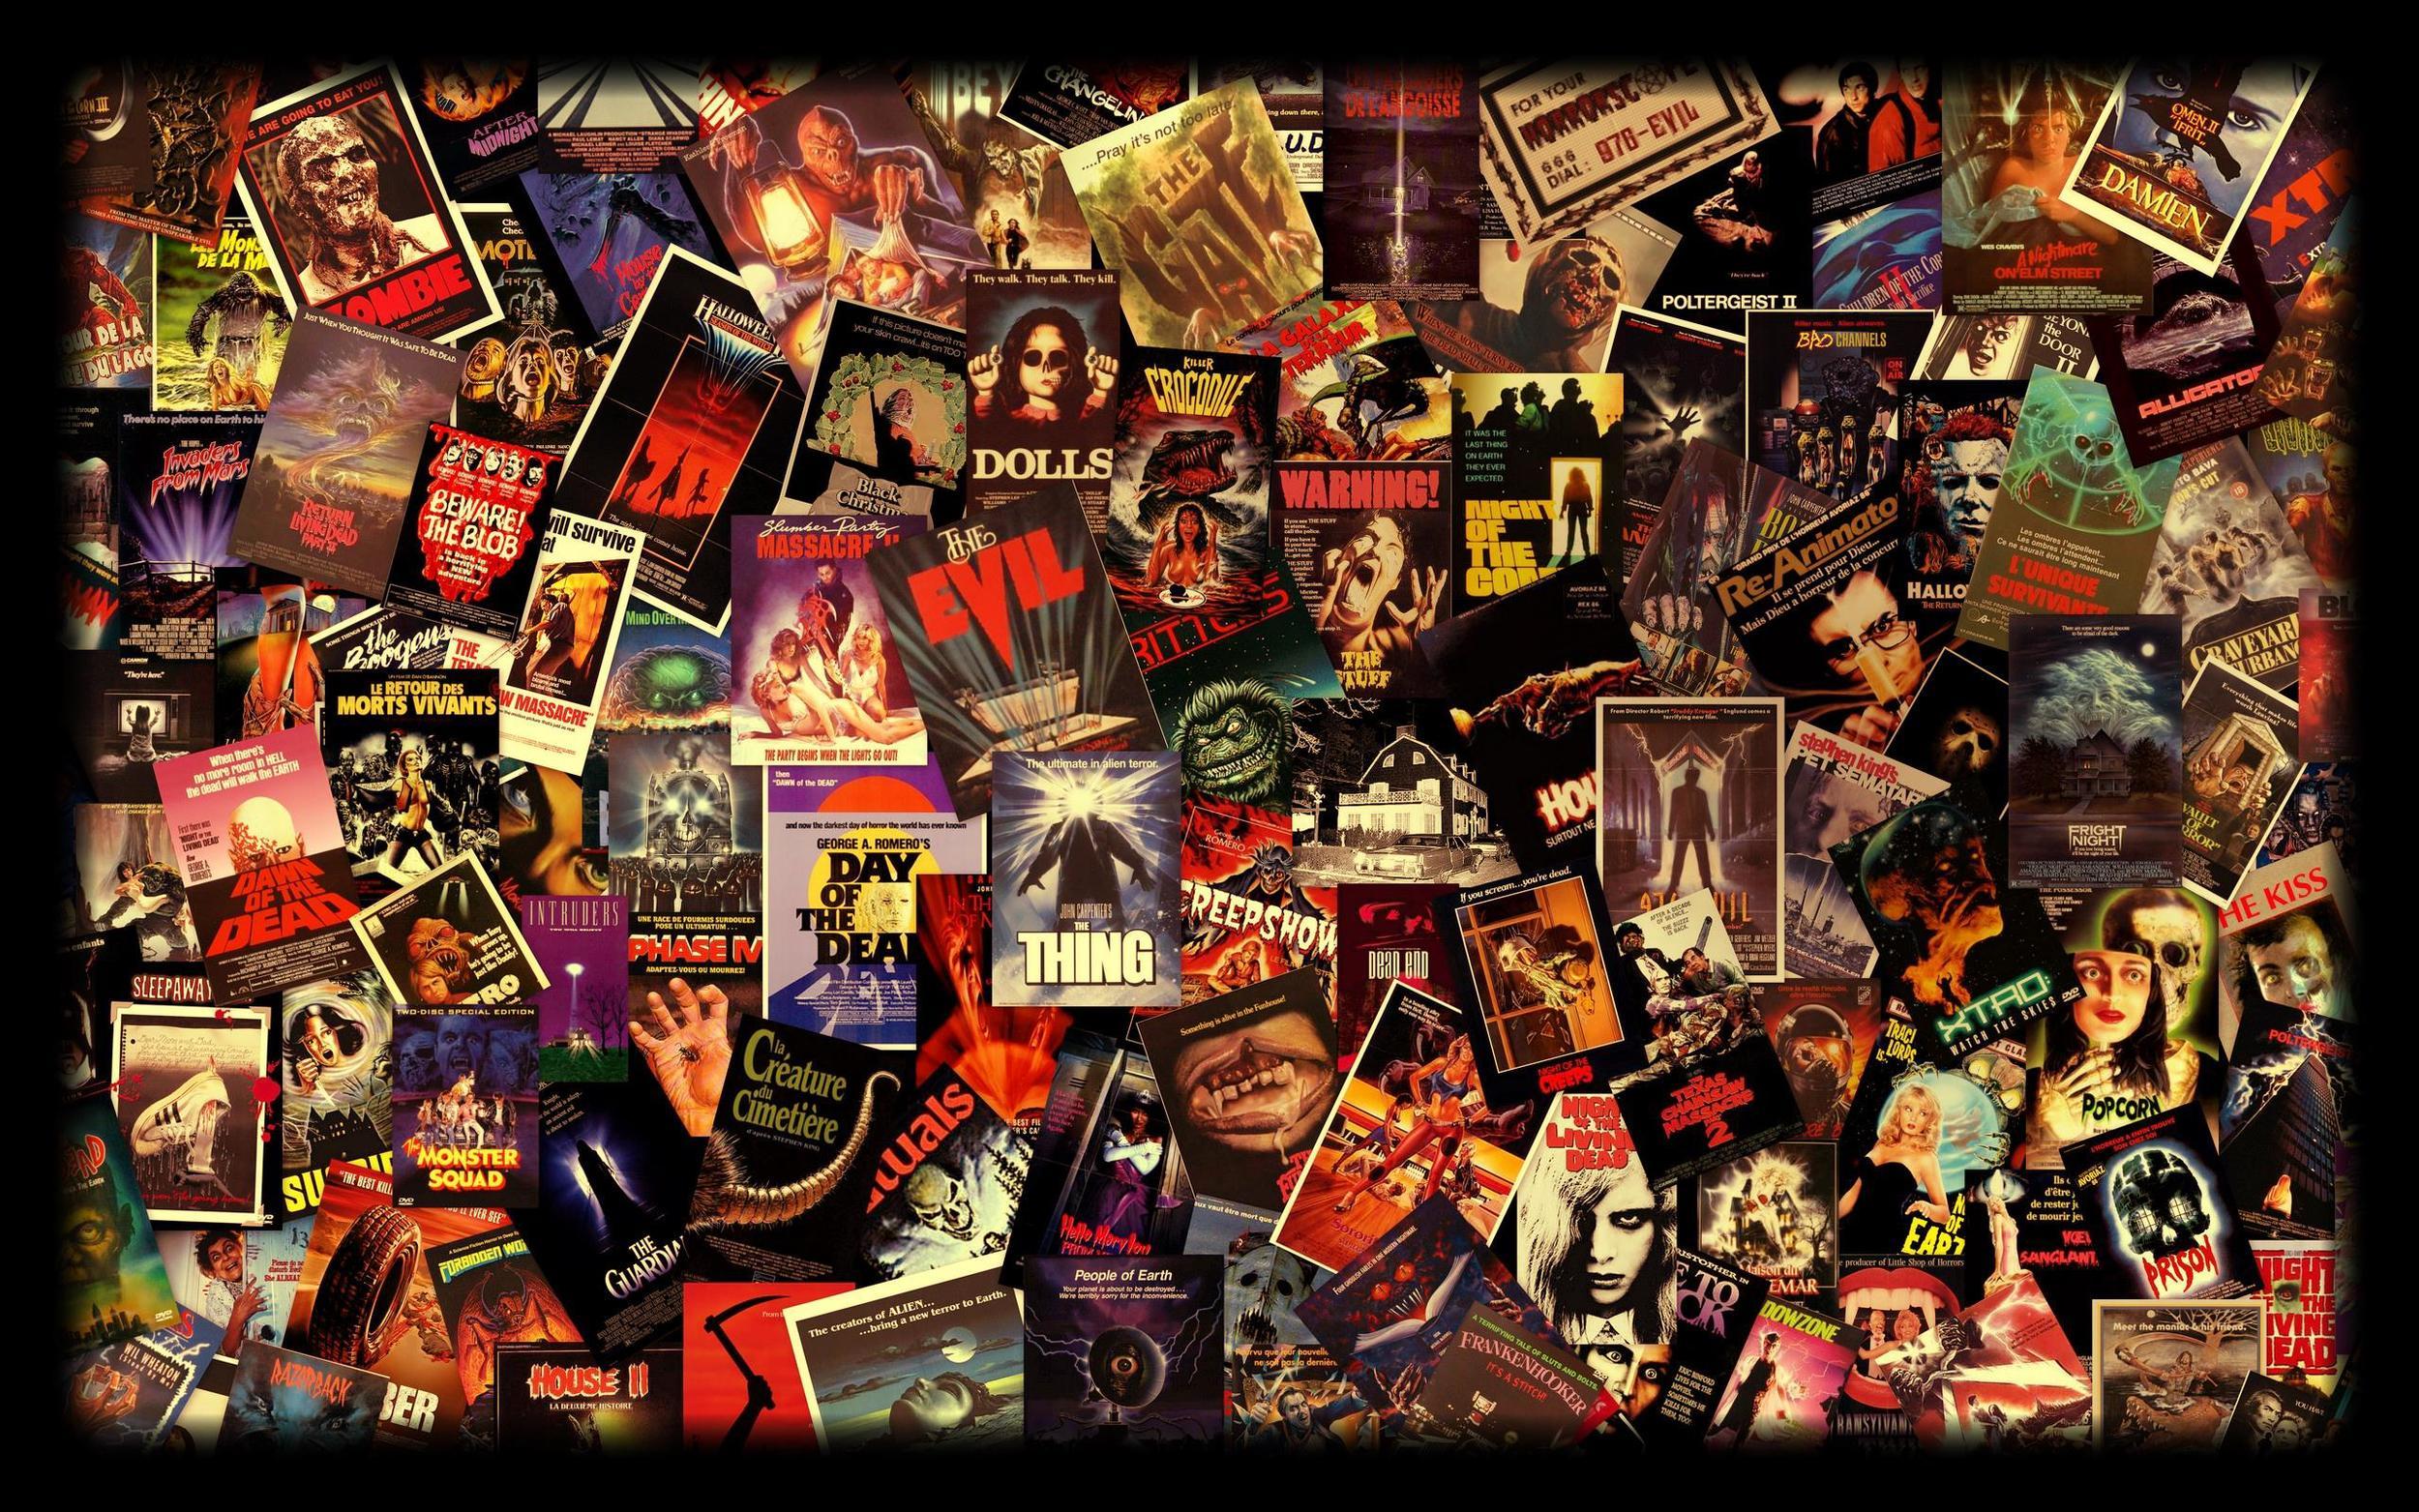 Massive-B-Horror-Collage-Wallpaper-horror-movies-29491579-2560-1600.jpg